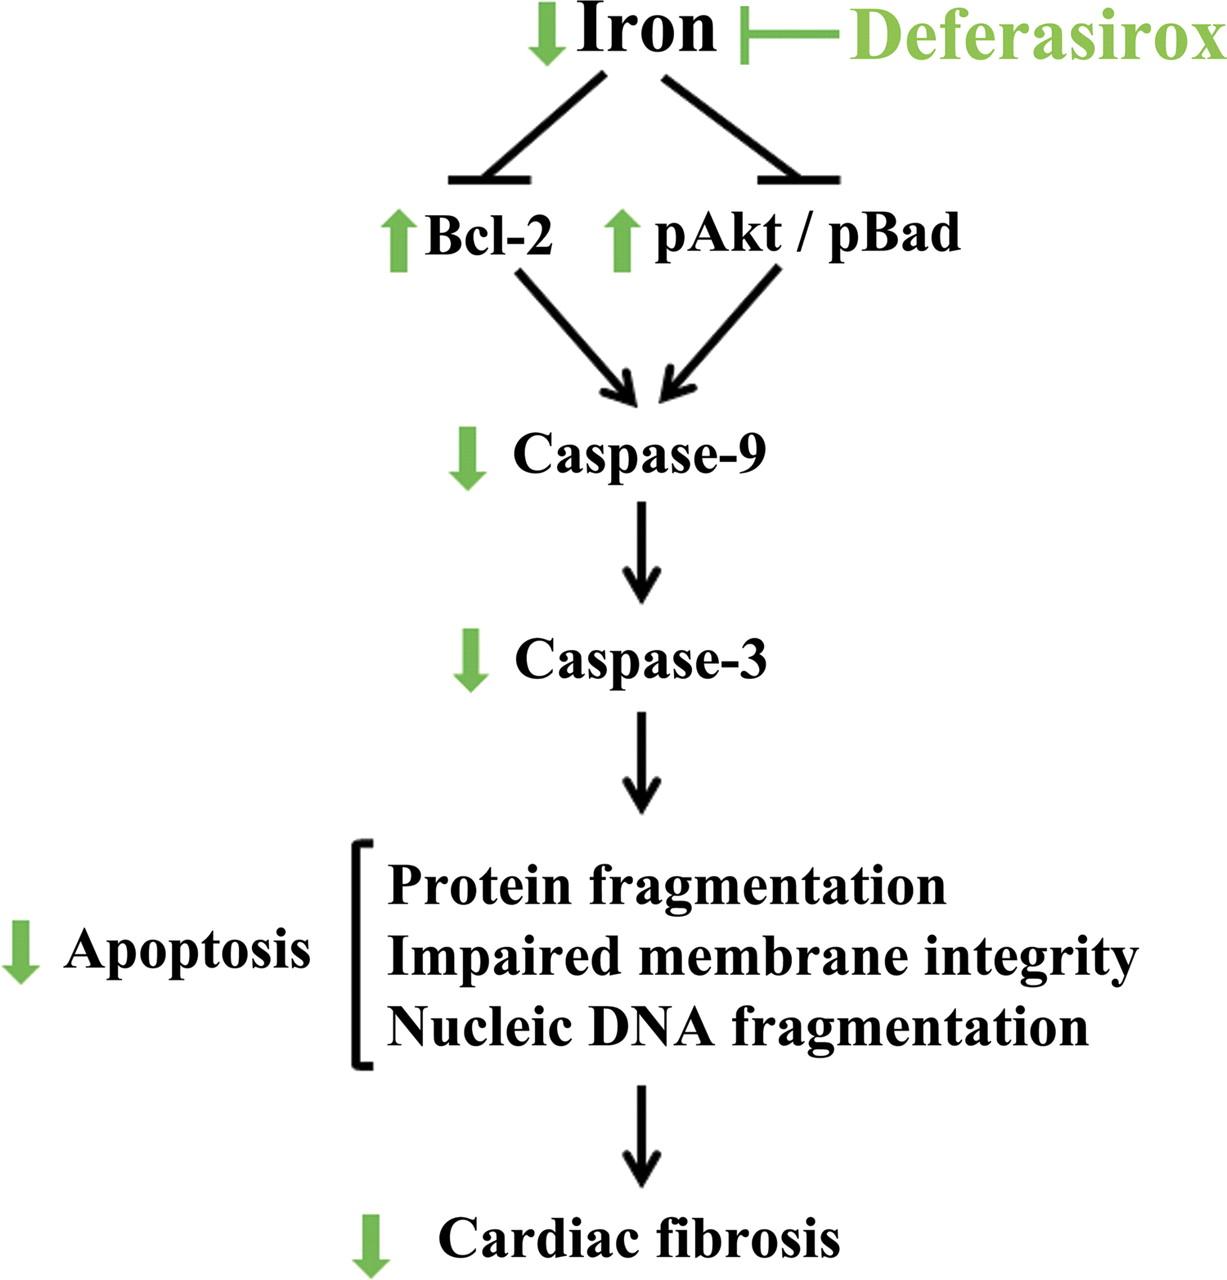 Iron Induced Cardiac Damage Role Of Apoptosis And Deferasirox